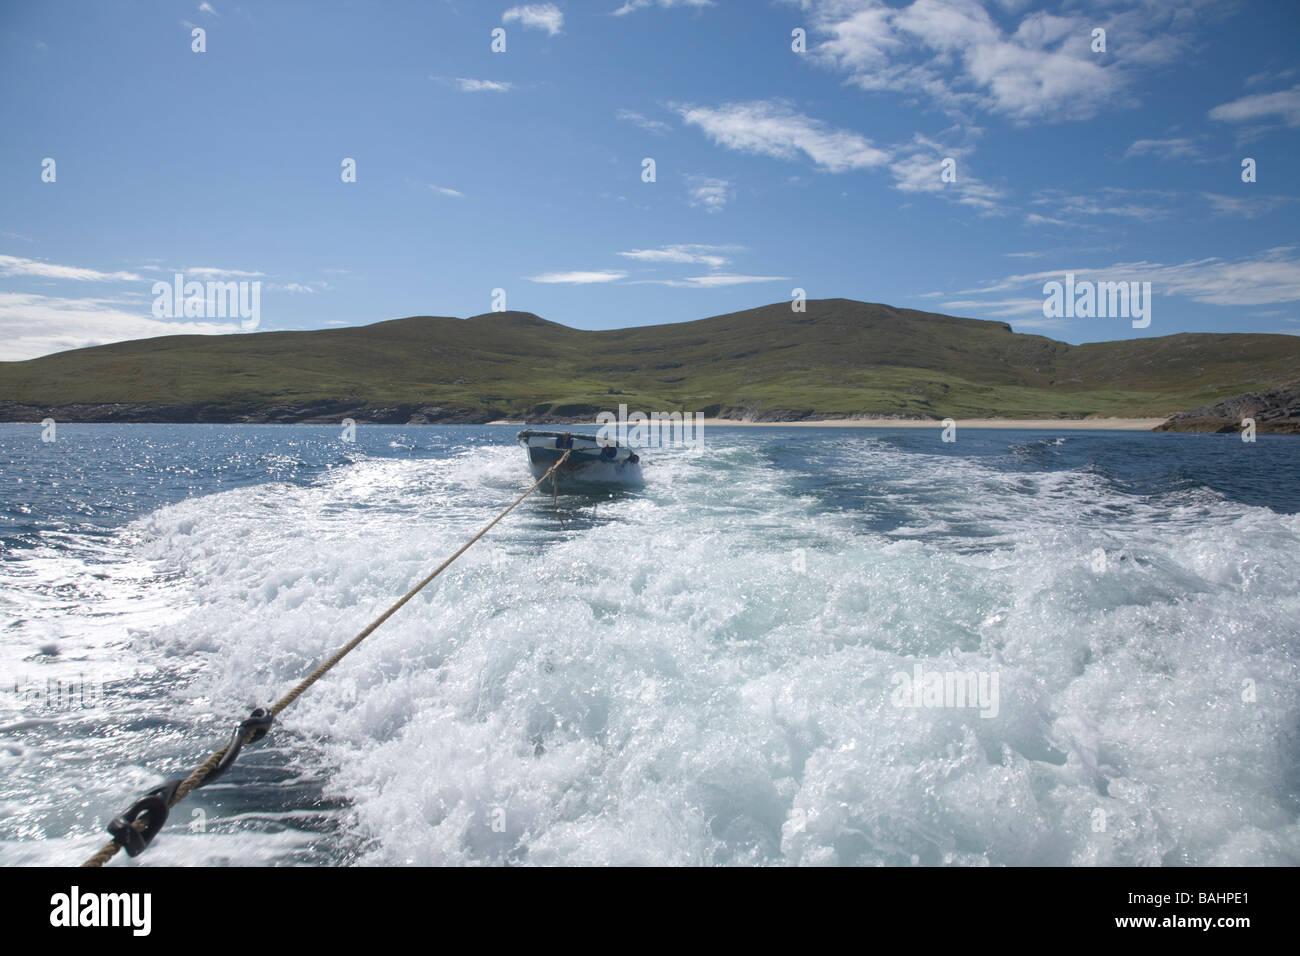 Deserted island of Mingulay Outer Hebrides United Kingdom Scotland GB Ferry to the island - Stock Image